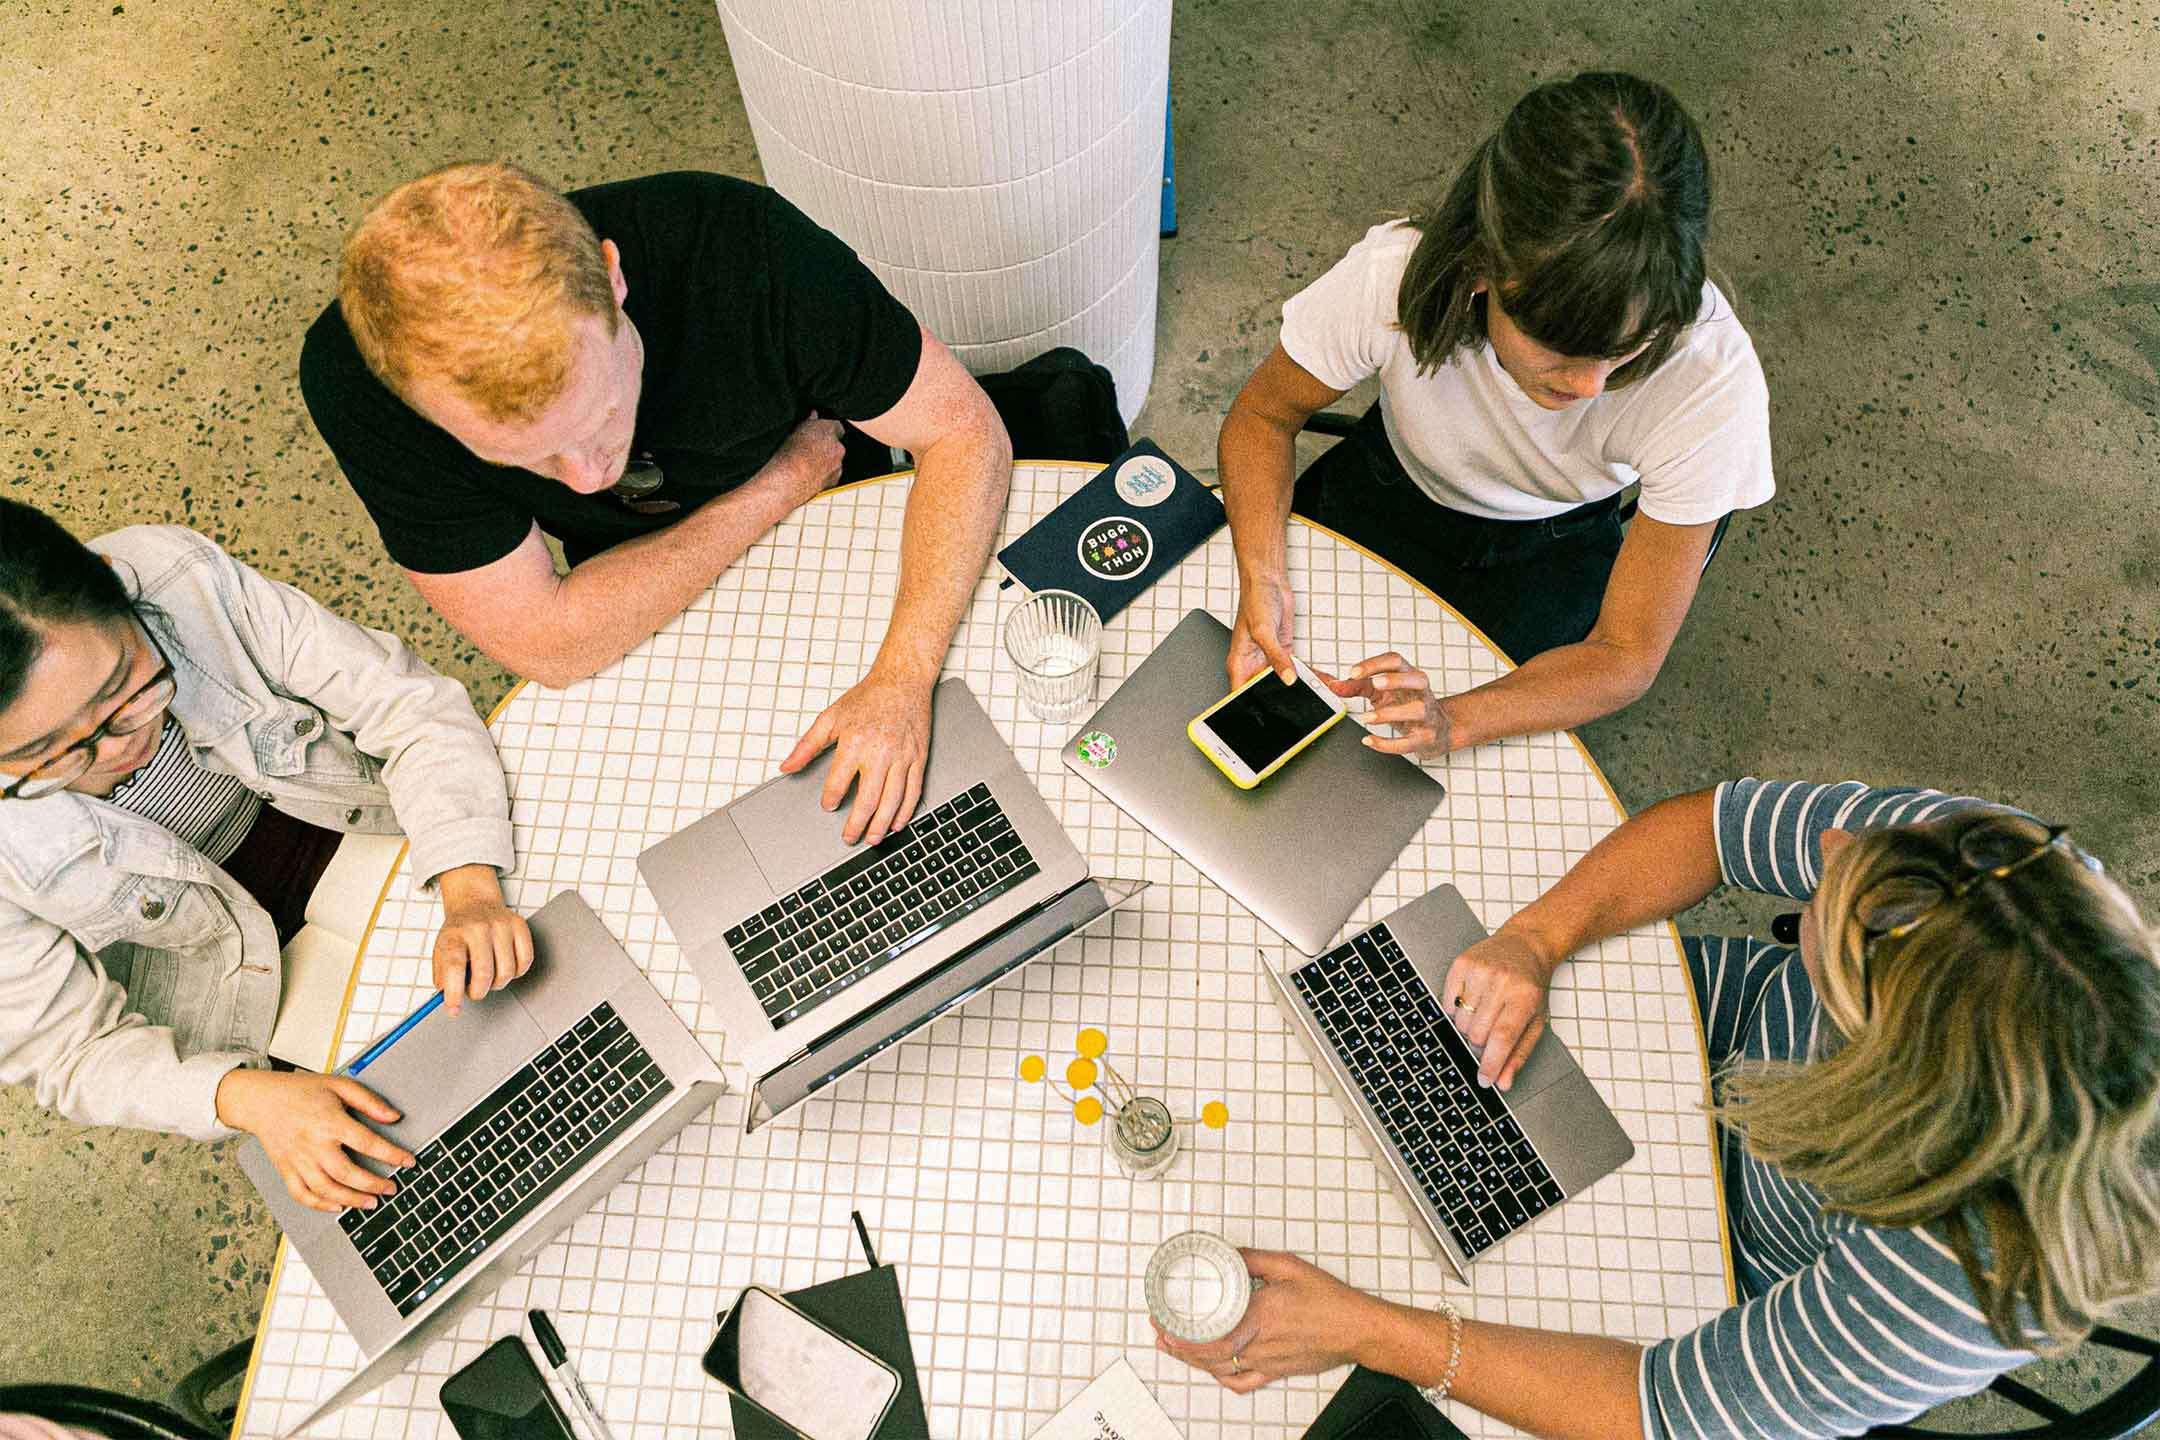 Startup_image.jpg